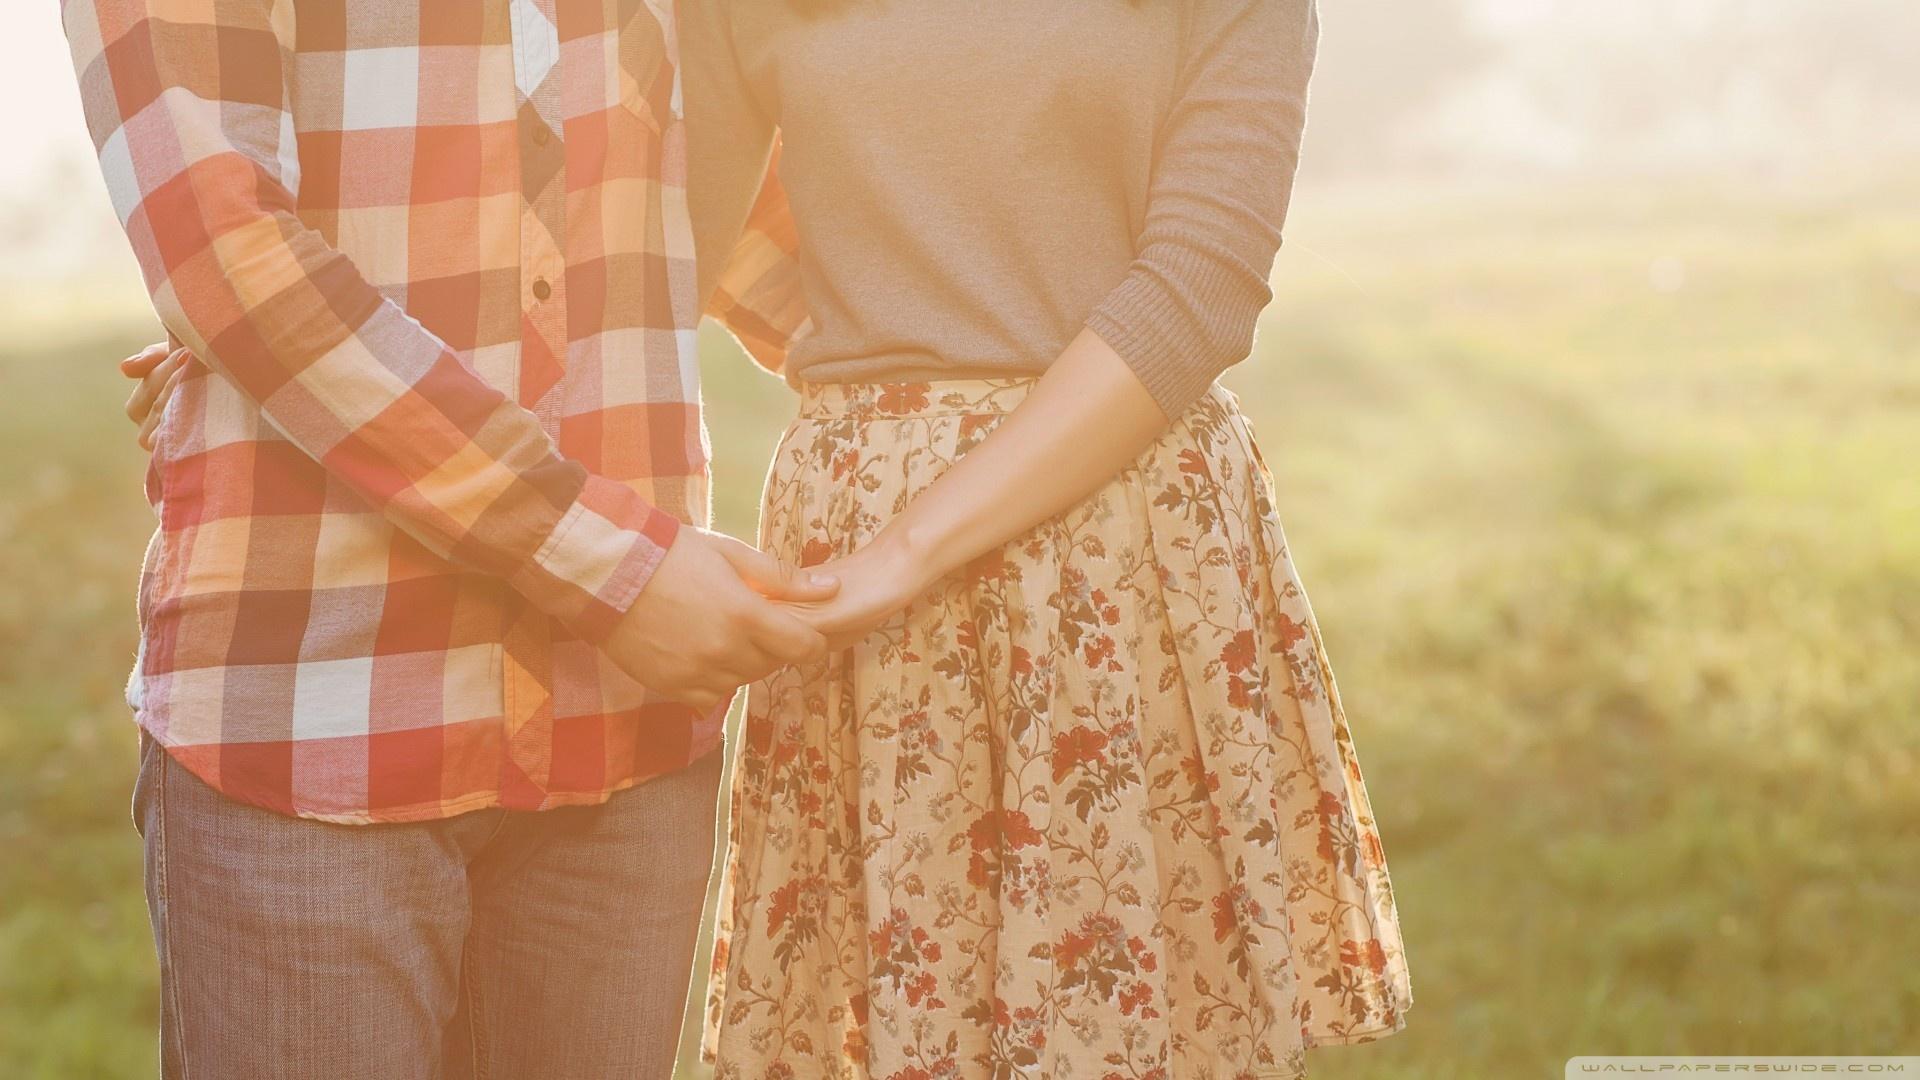 Cute Couples Holding Hands Wallpapers Love Is Vintage Memories 4k Hd Desktop Wallpaper For 4k